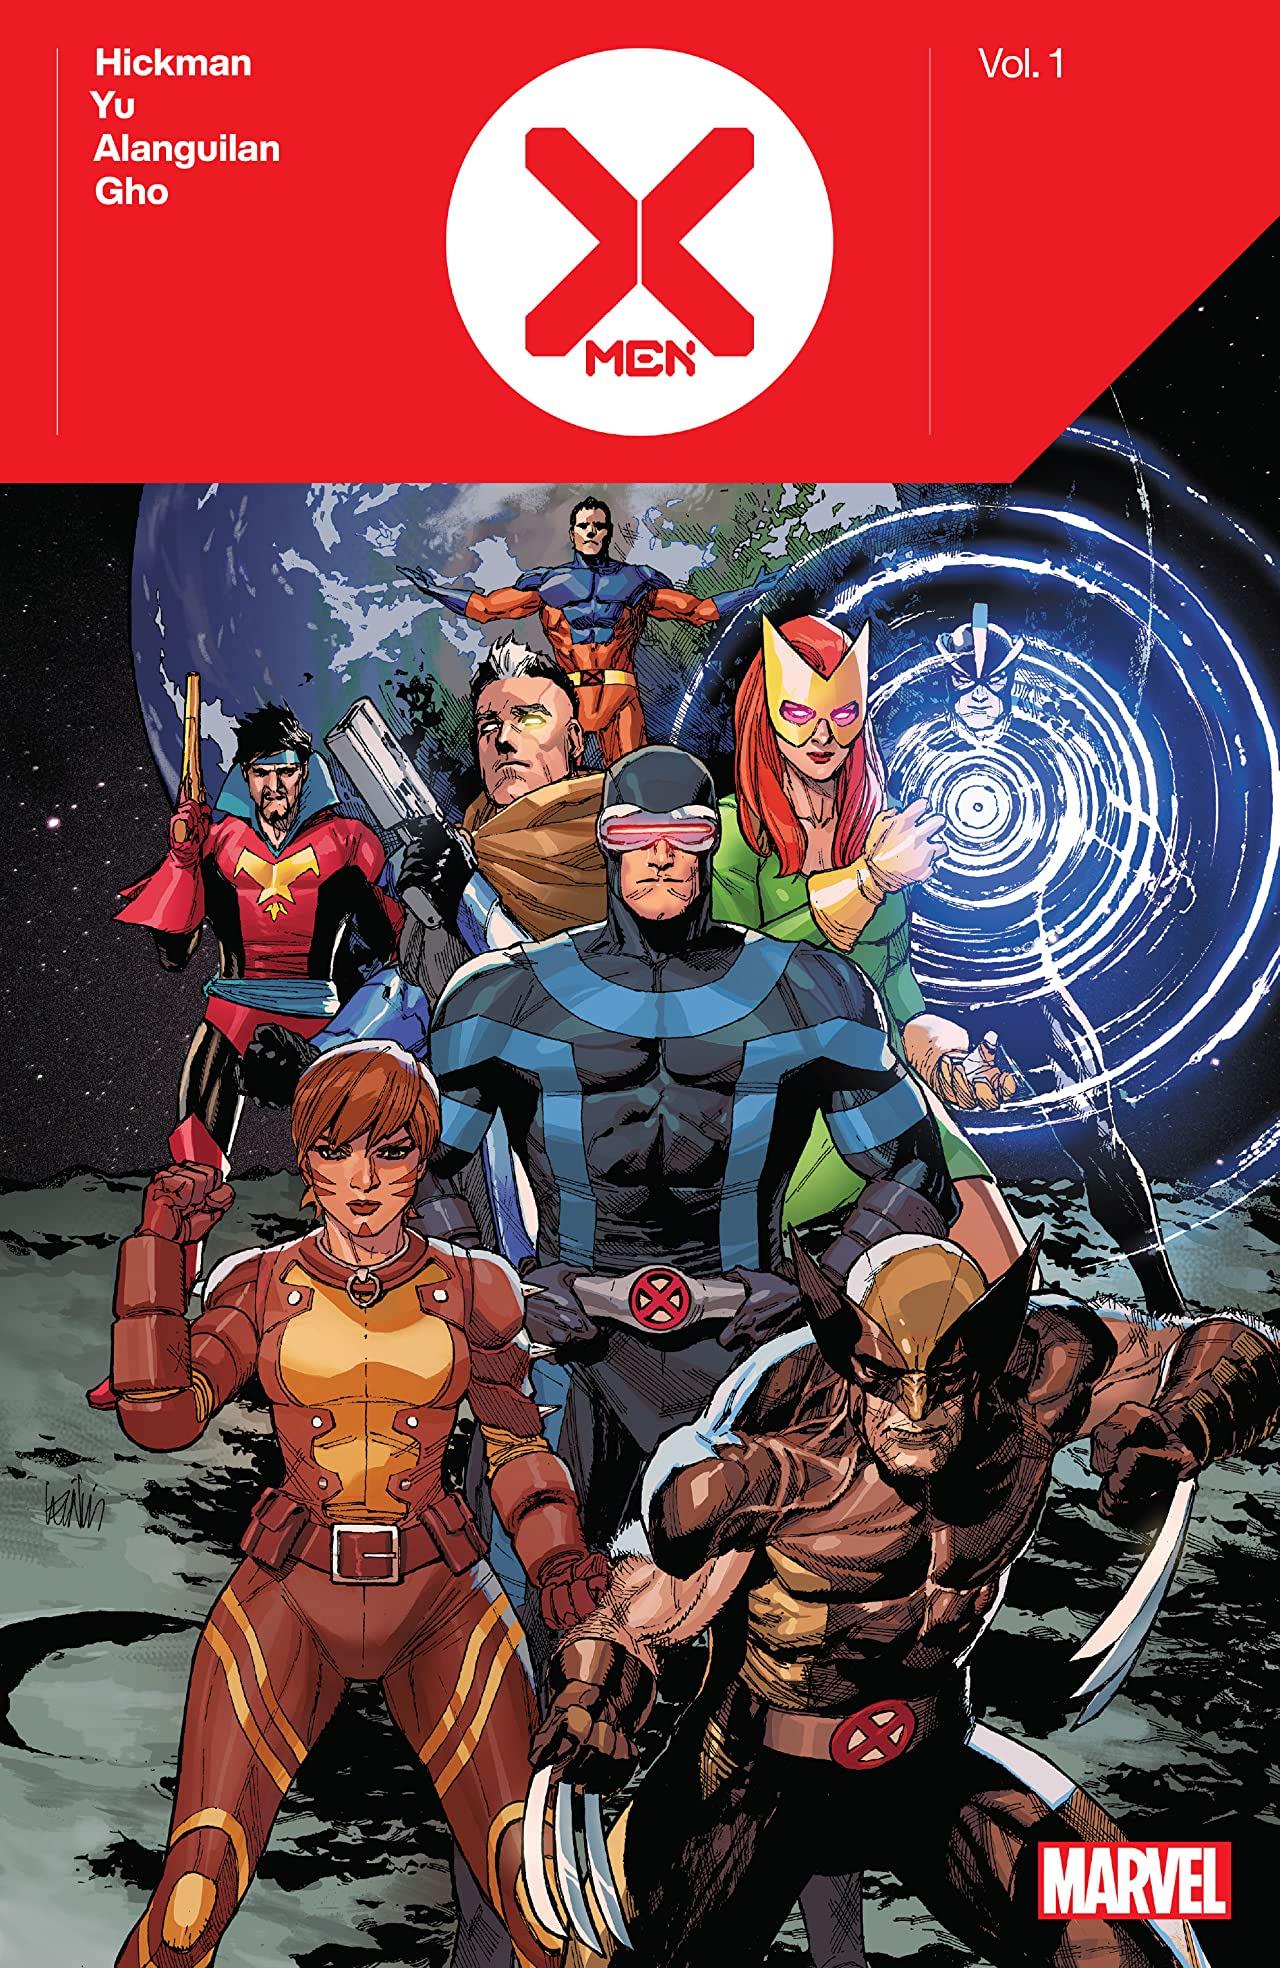 X-Men by Jonathan Hickman Vol. 1 (Trade Paperback)